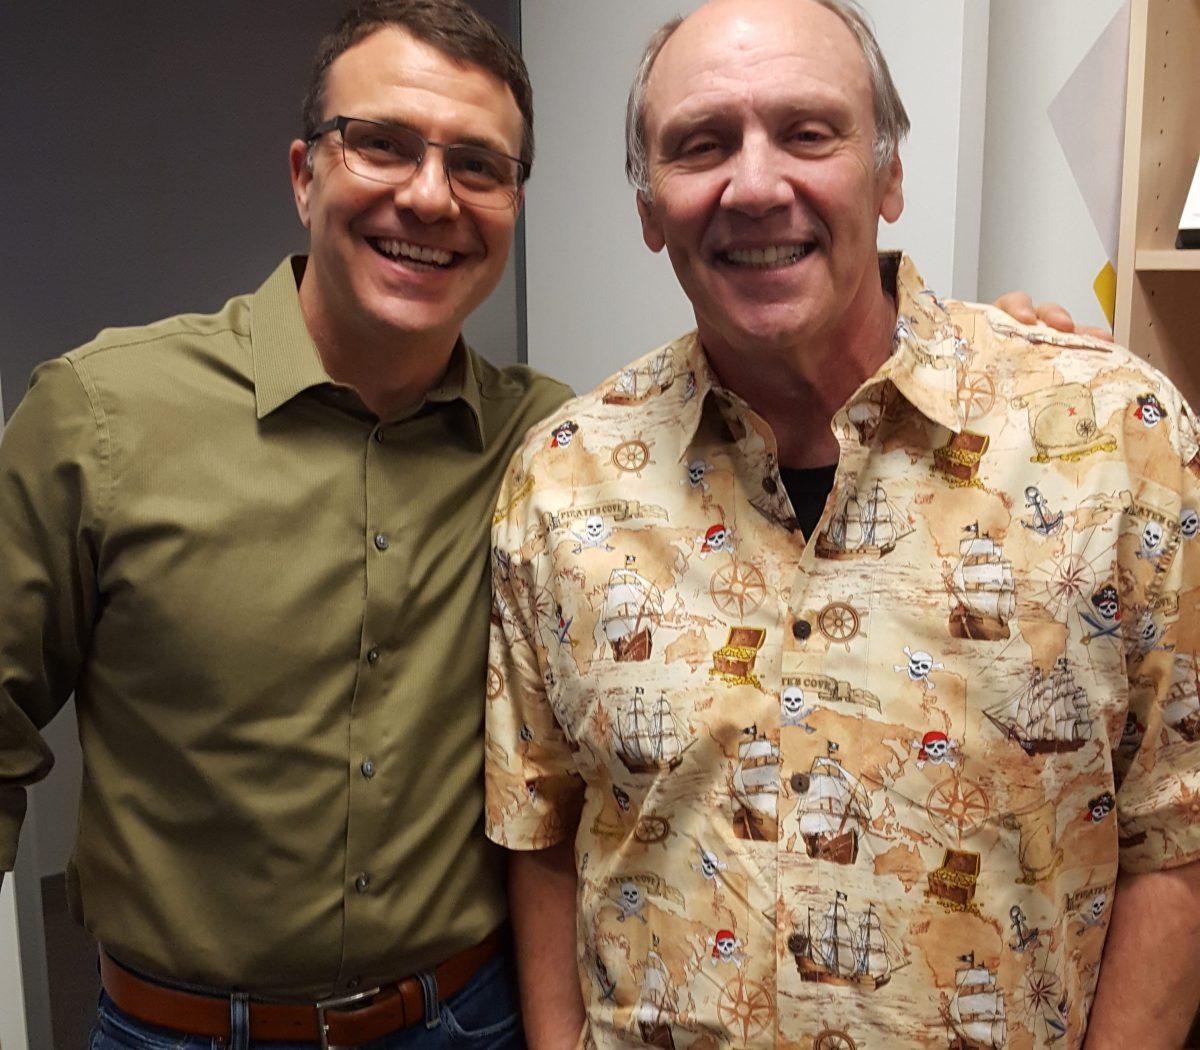 Tom Smith and Bill Handel